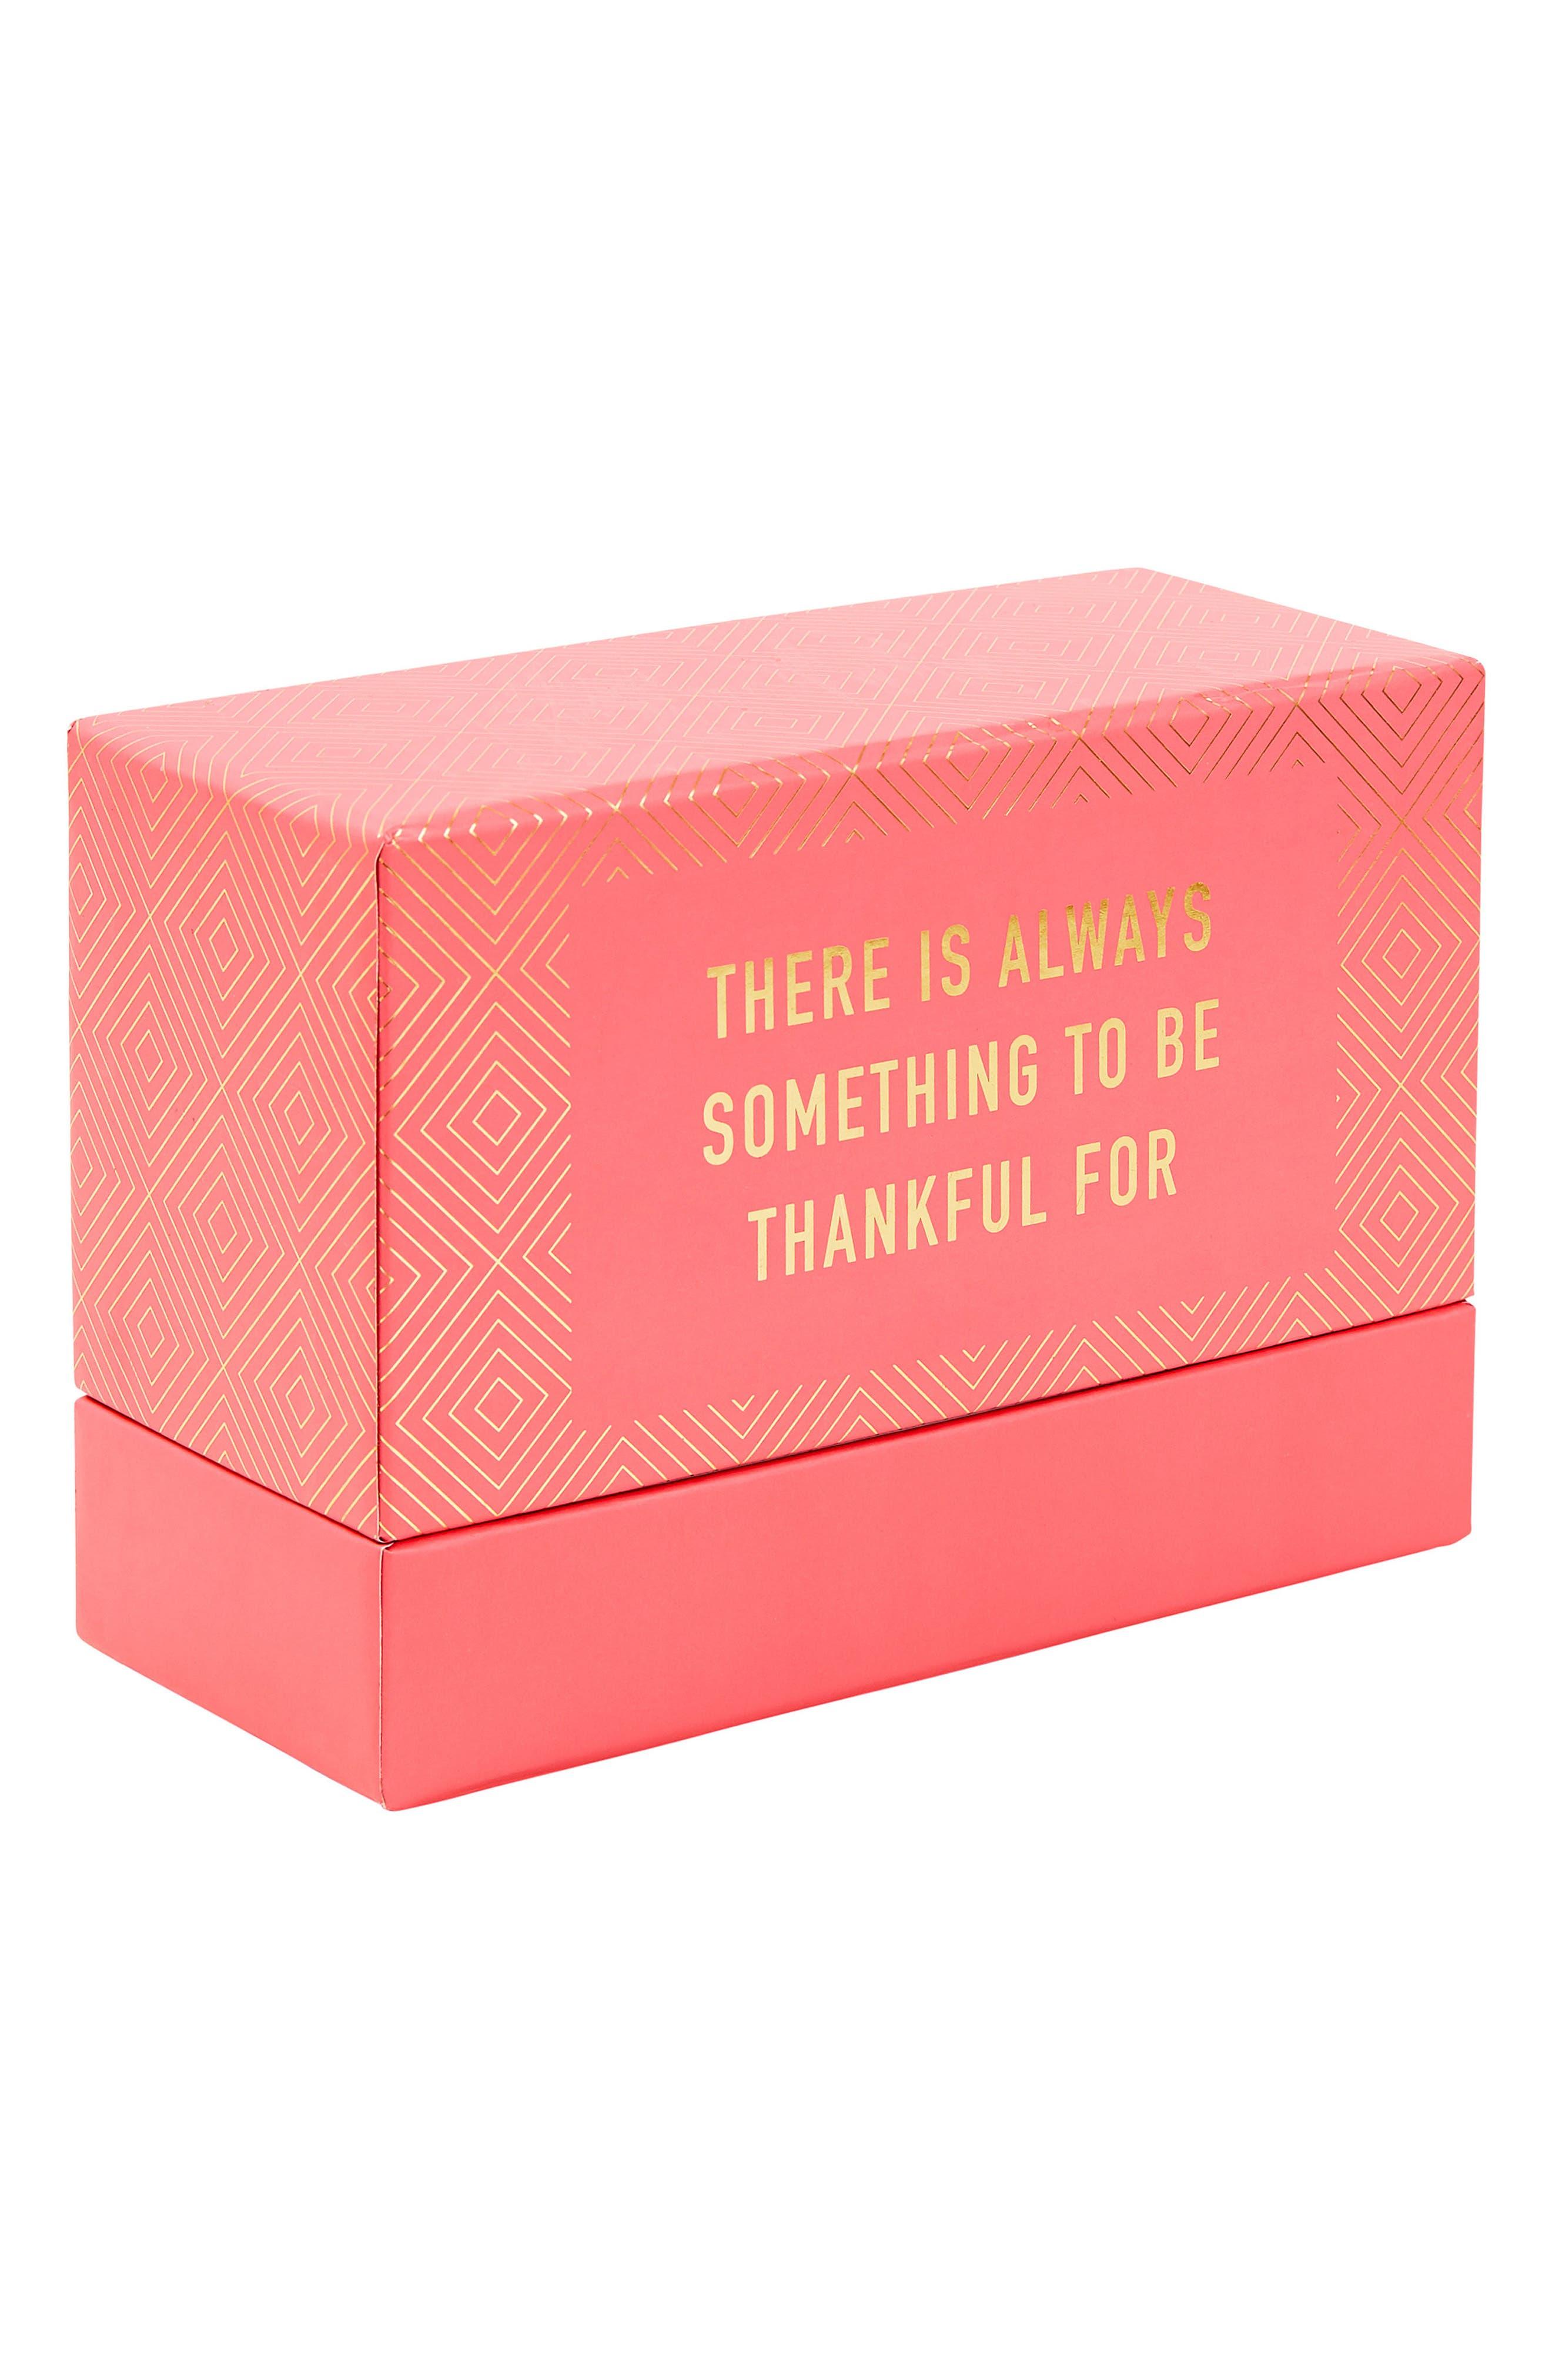 52 Inspirational Cards Box Set,                             Main thumbnail 1, color,                             Multi